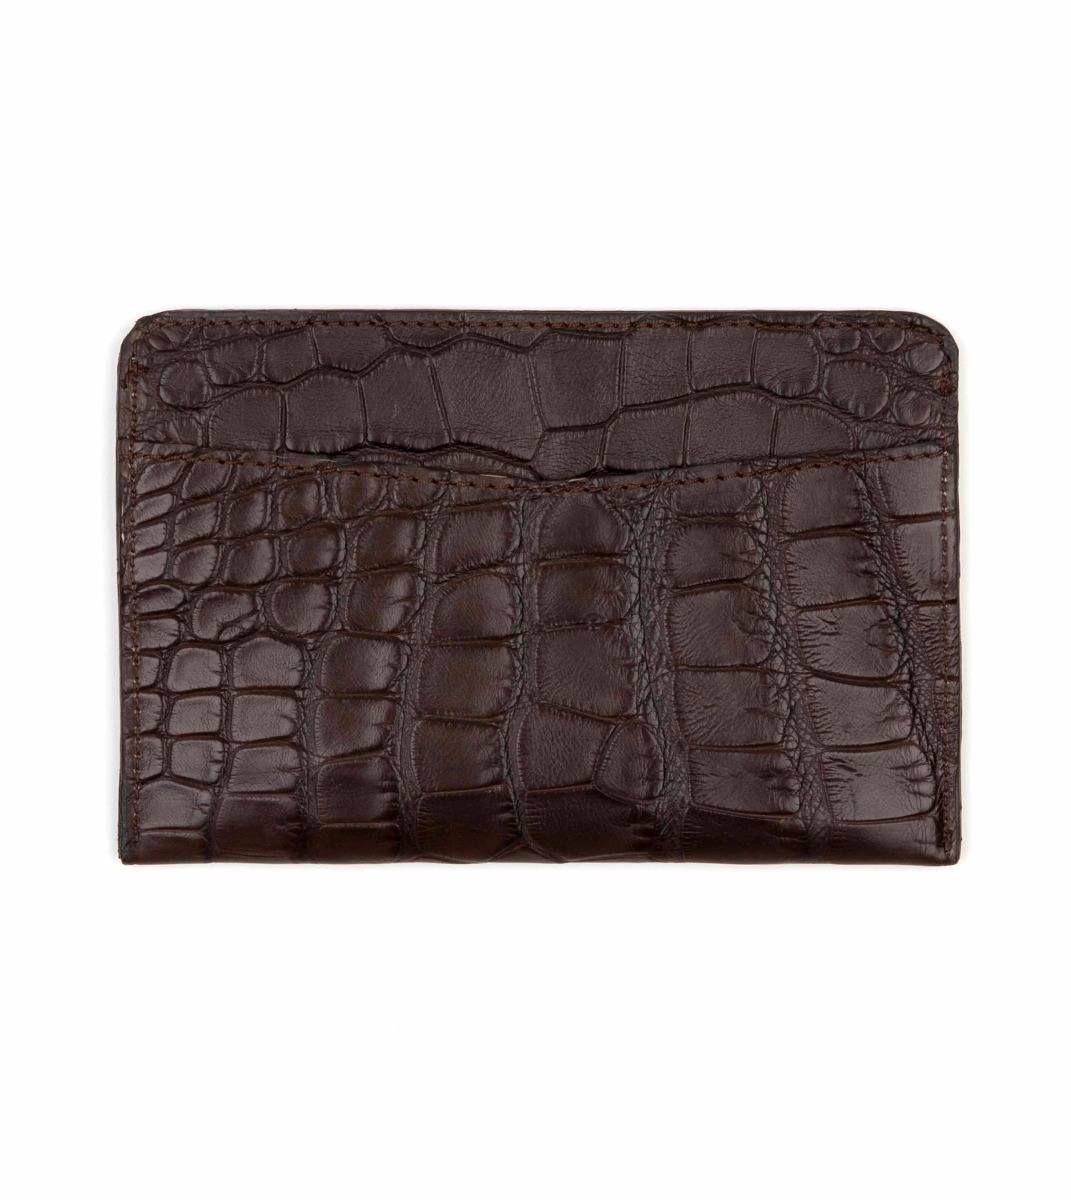 Alligator Leather ID Wallet